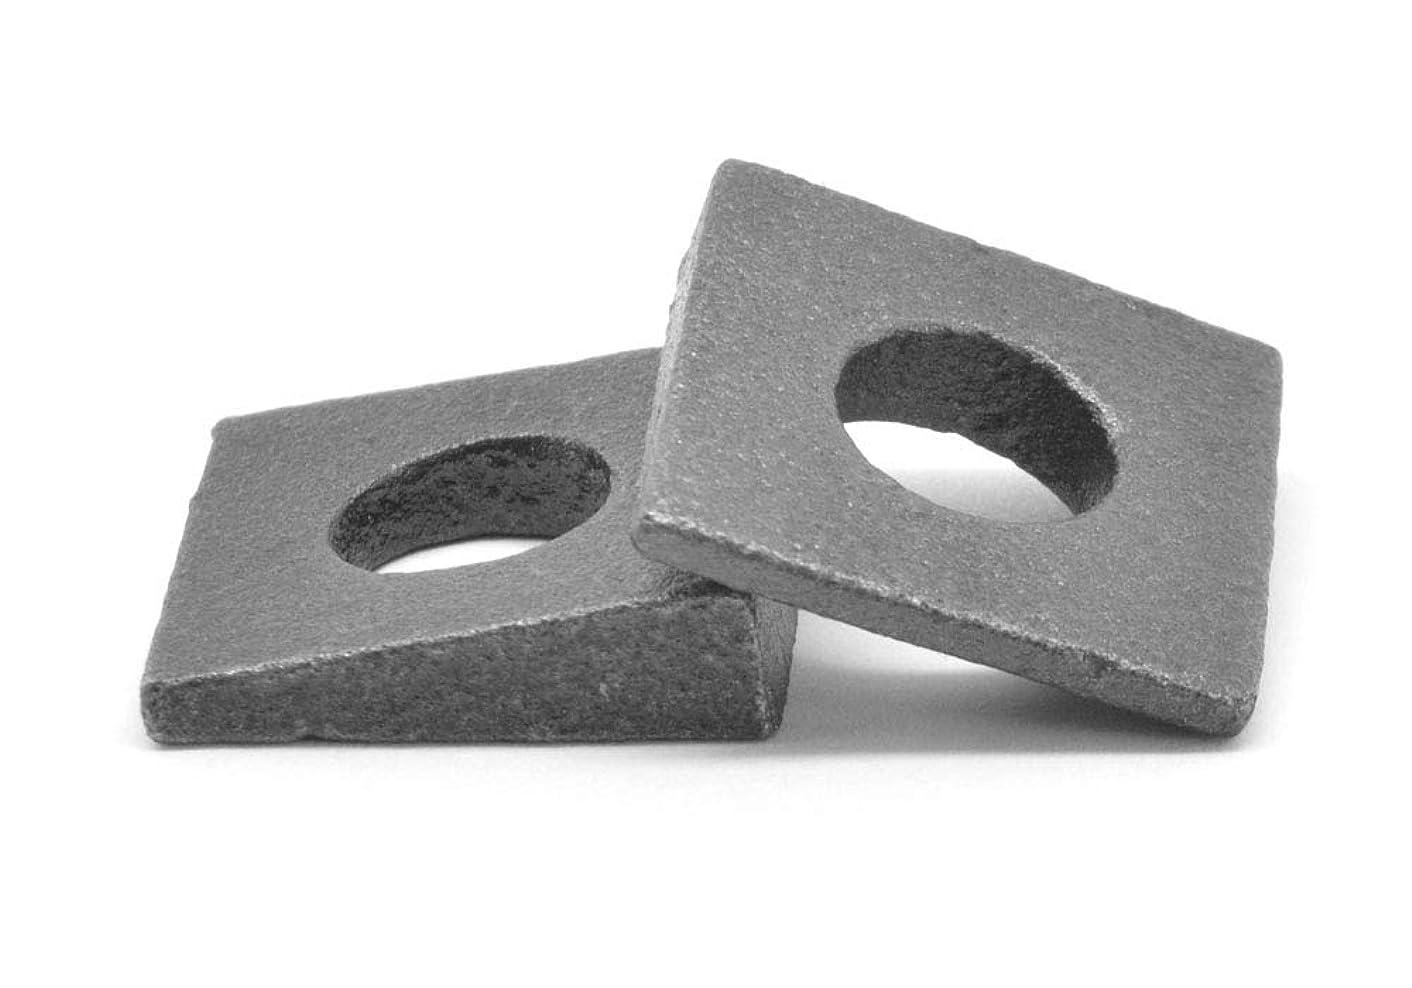 5/16 Square Beveled Malleable Washer Malleable Iron Plain Finish Pk 25